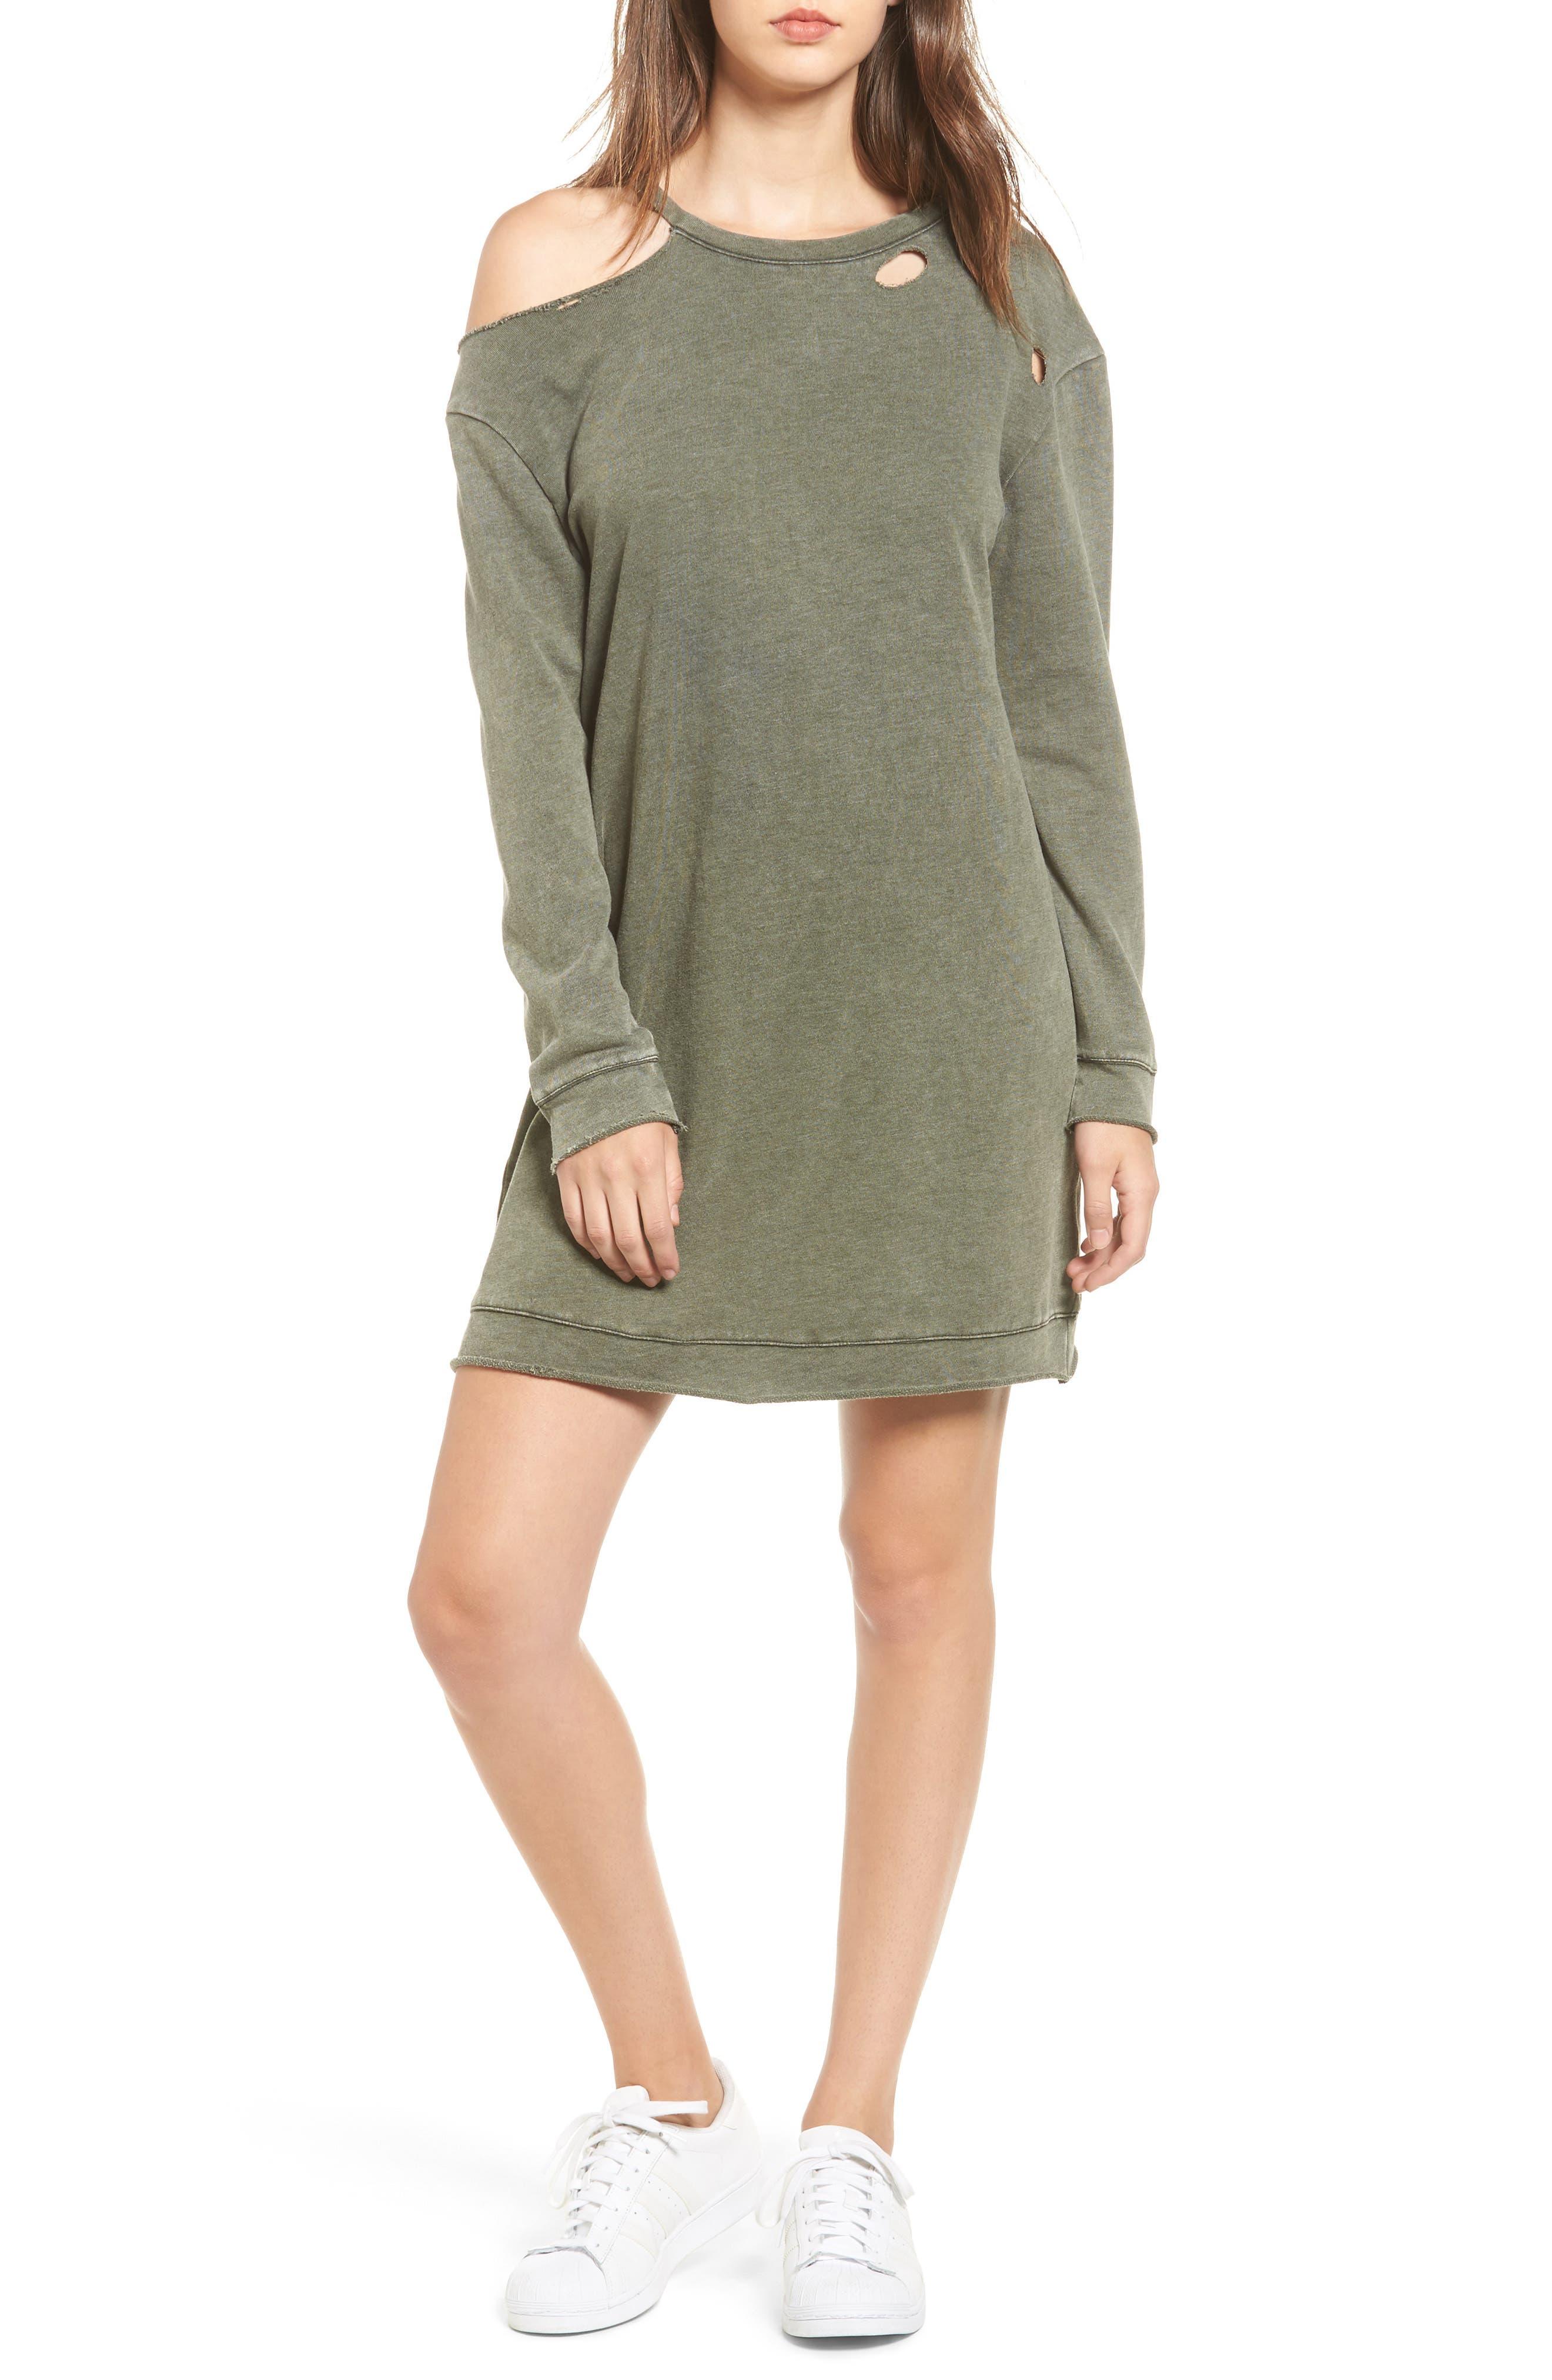 Ripped Sweatshirt Dress,                         Main,                         color, 309